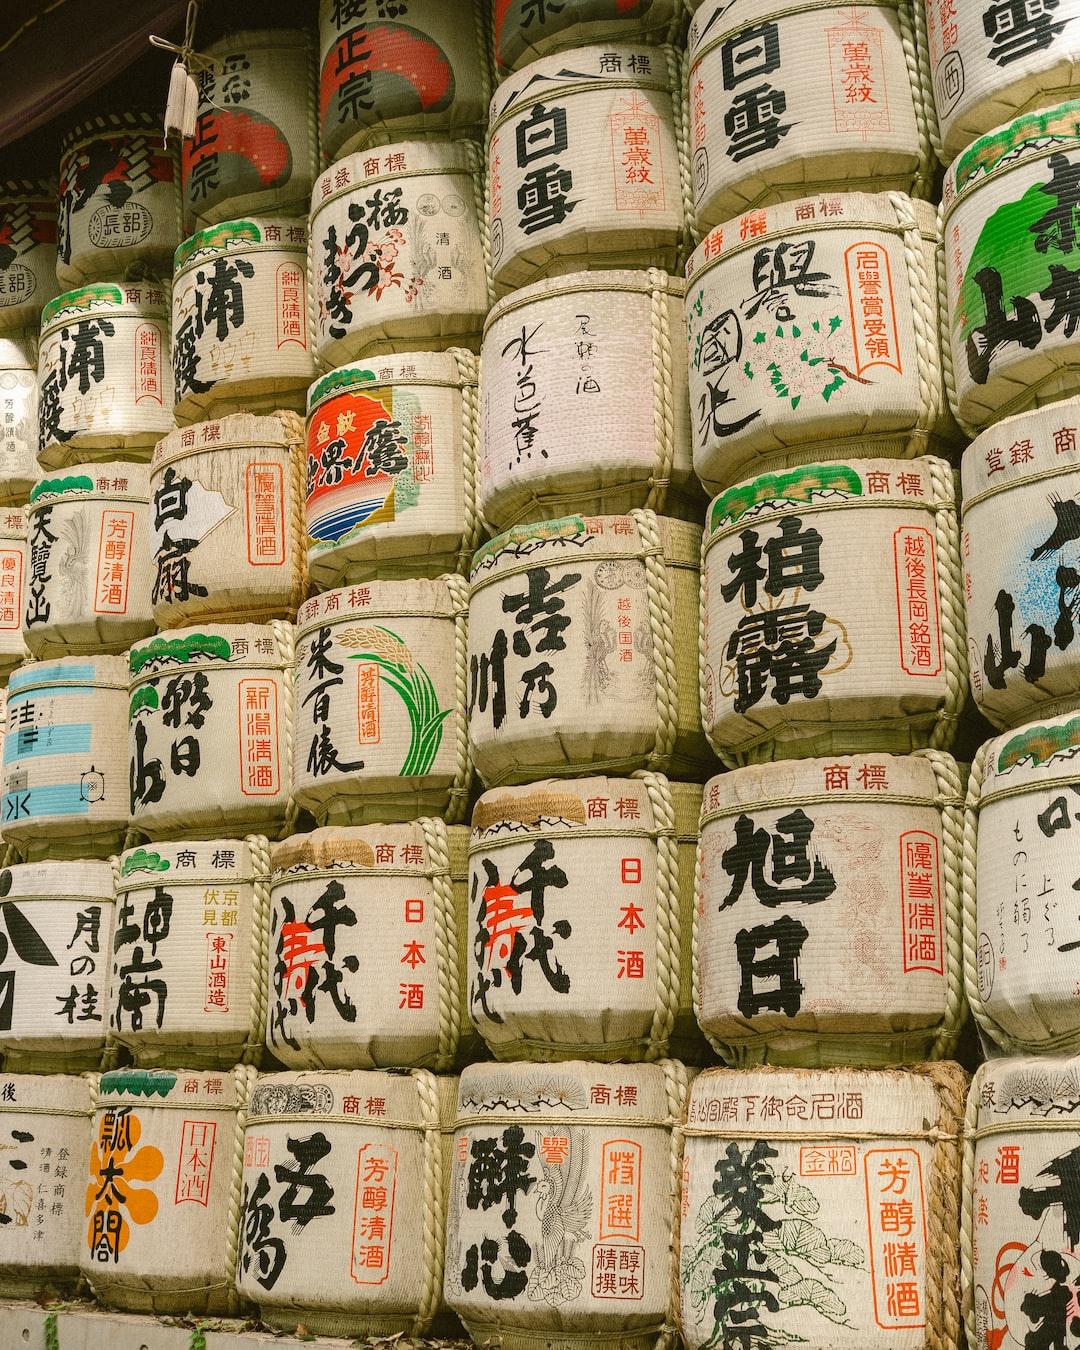 Meiji Jingu Shrine Sake Barrels, Tokyo, Japan.